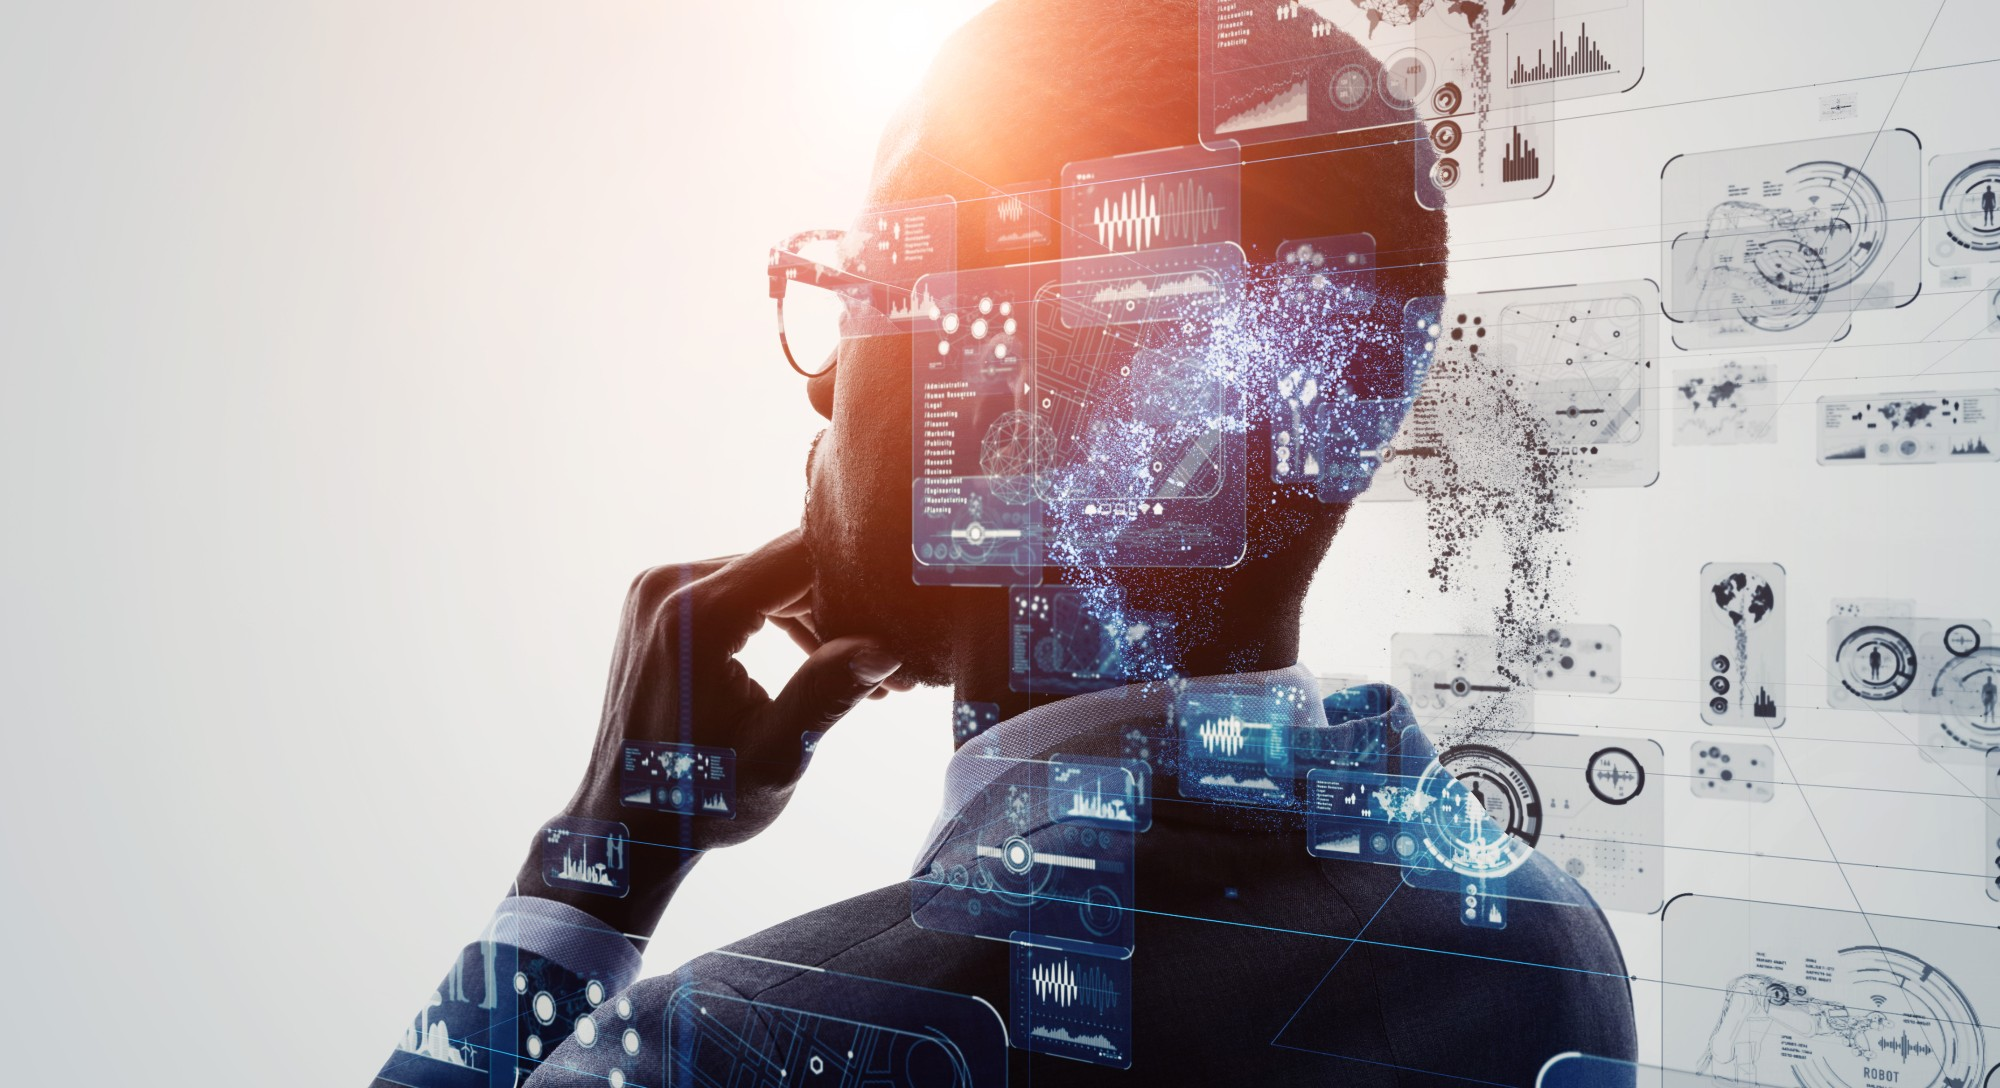 Proper data hygiene critical as enterprises focus on AI governance